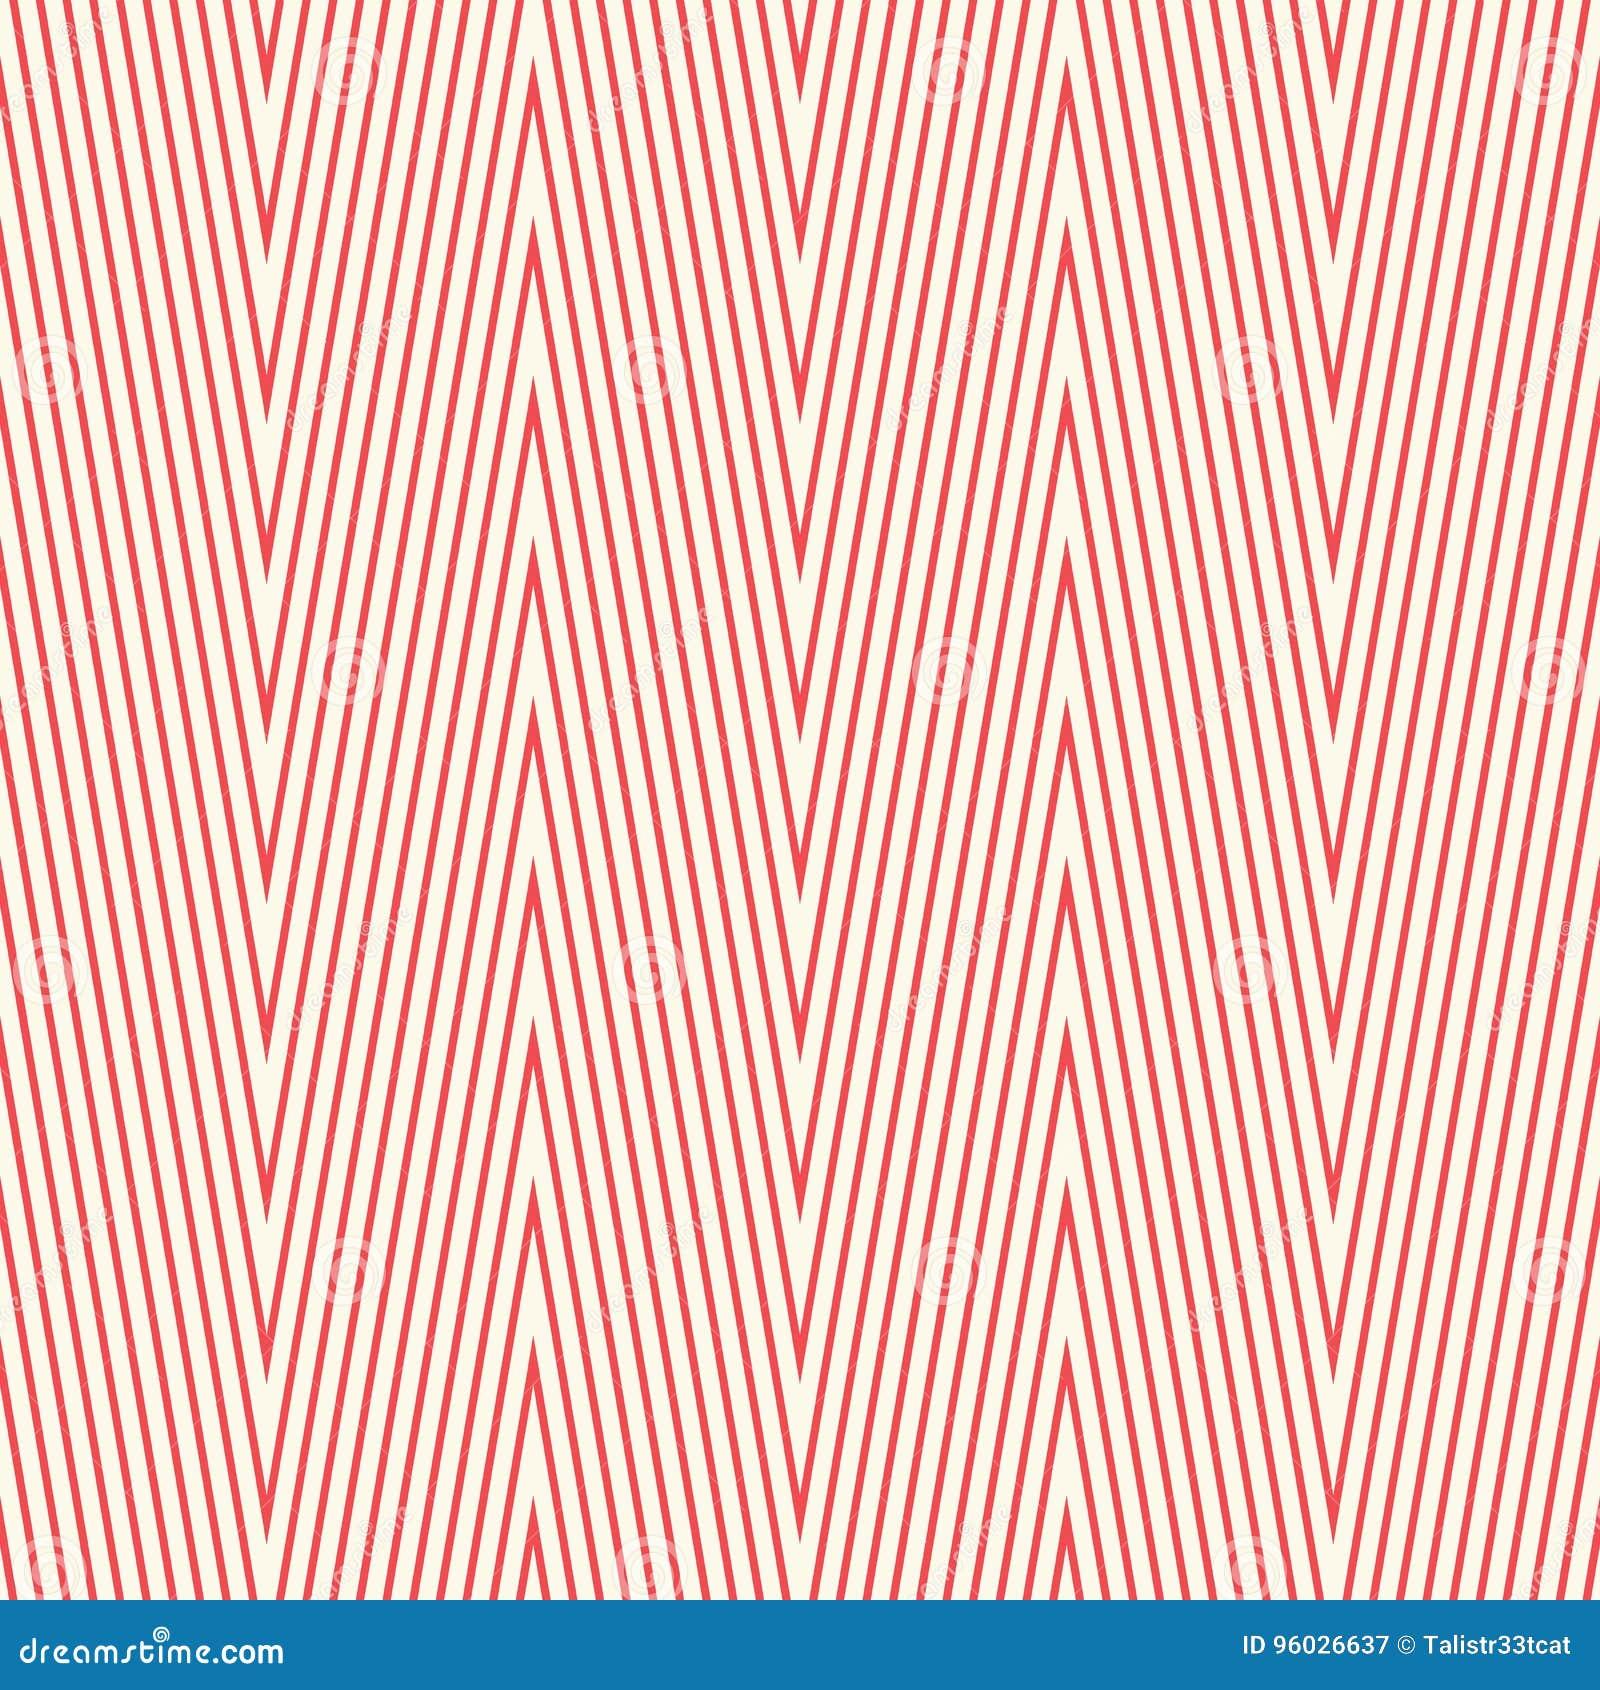 Szewronu wzór Bezszwowa zygzakowata tapeta